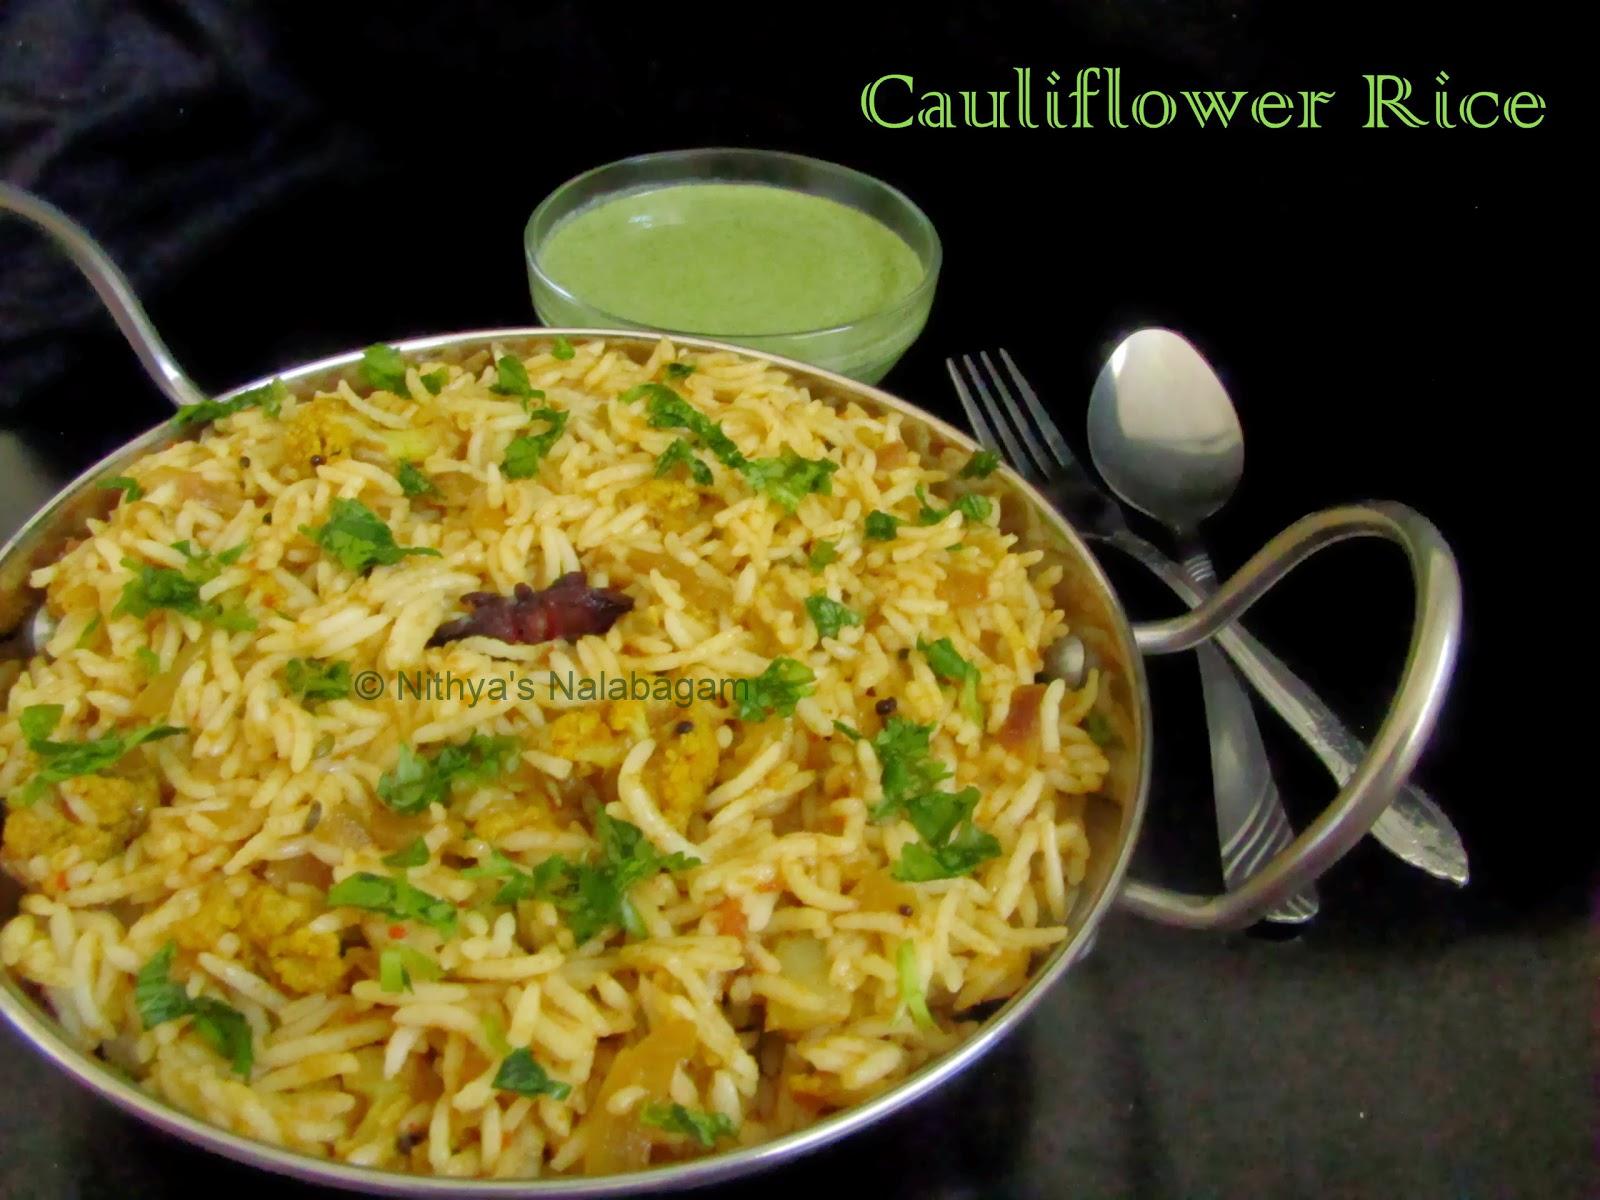 Cauliflower Rice South Indian Style |Nithya's Nalabagam